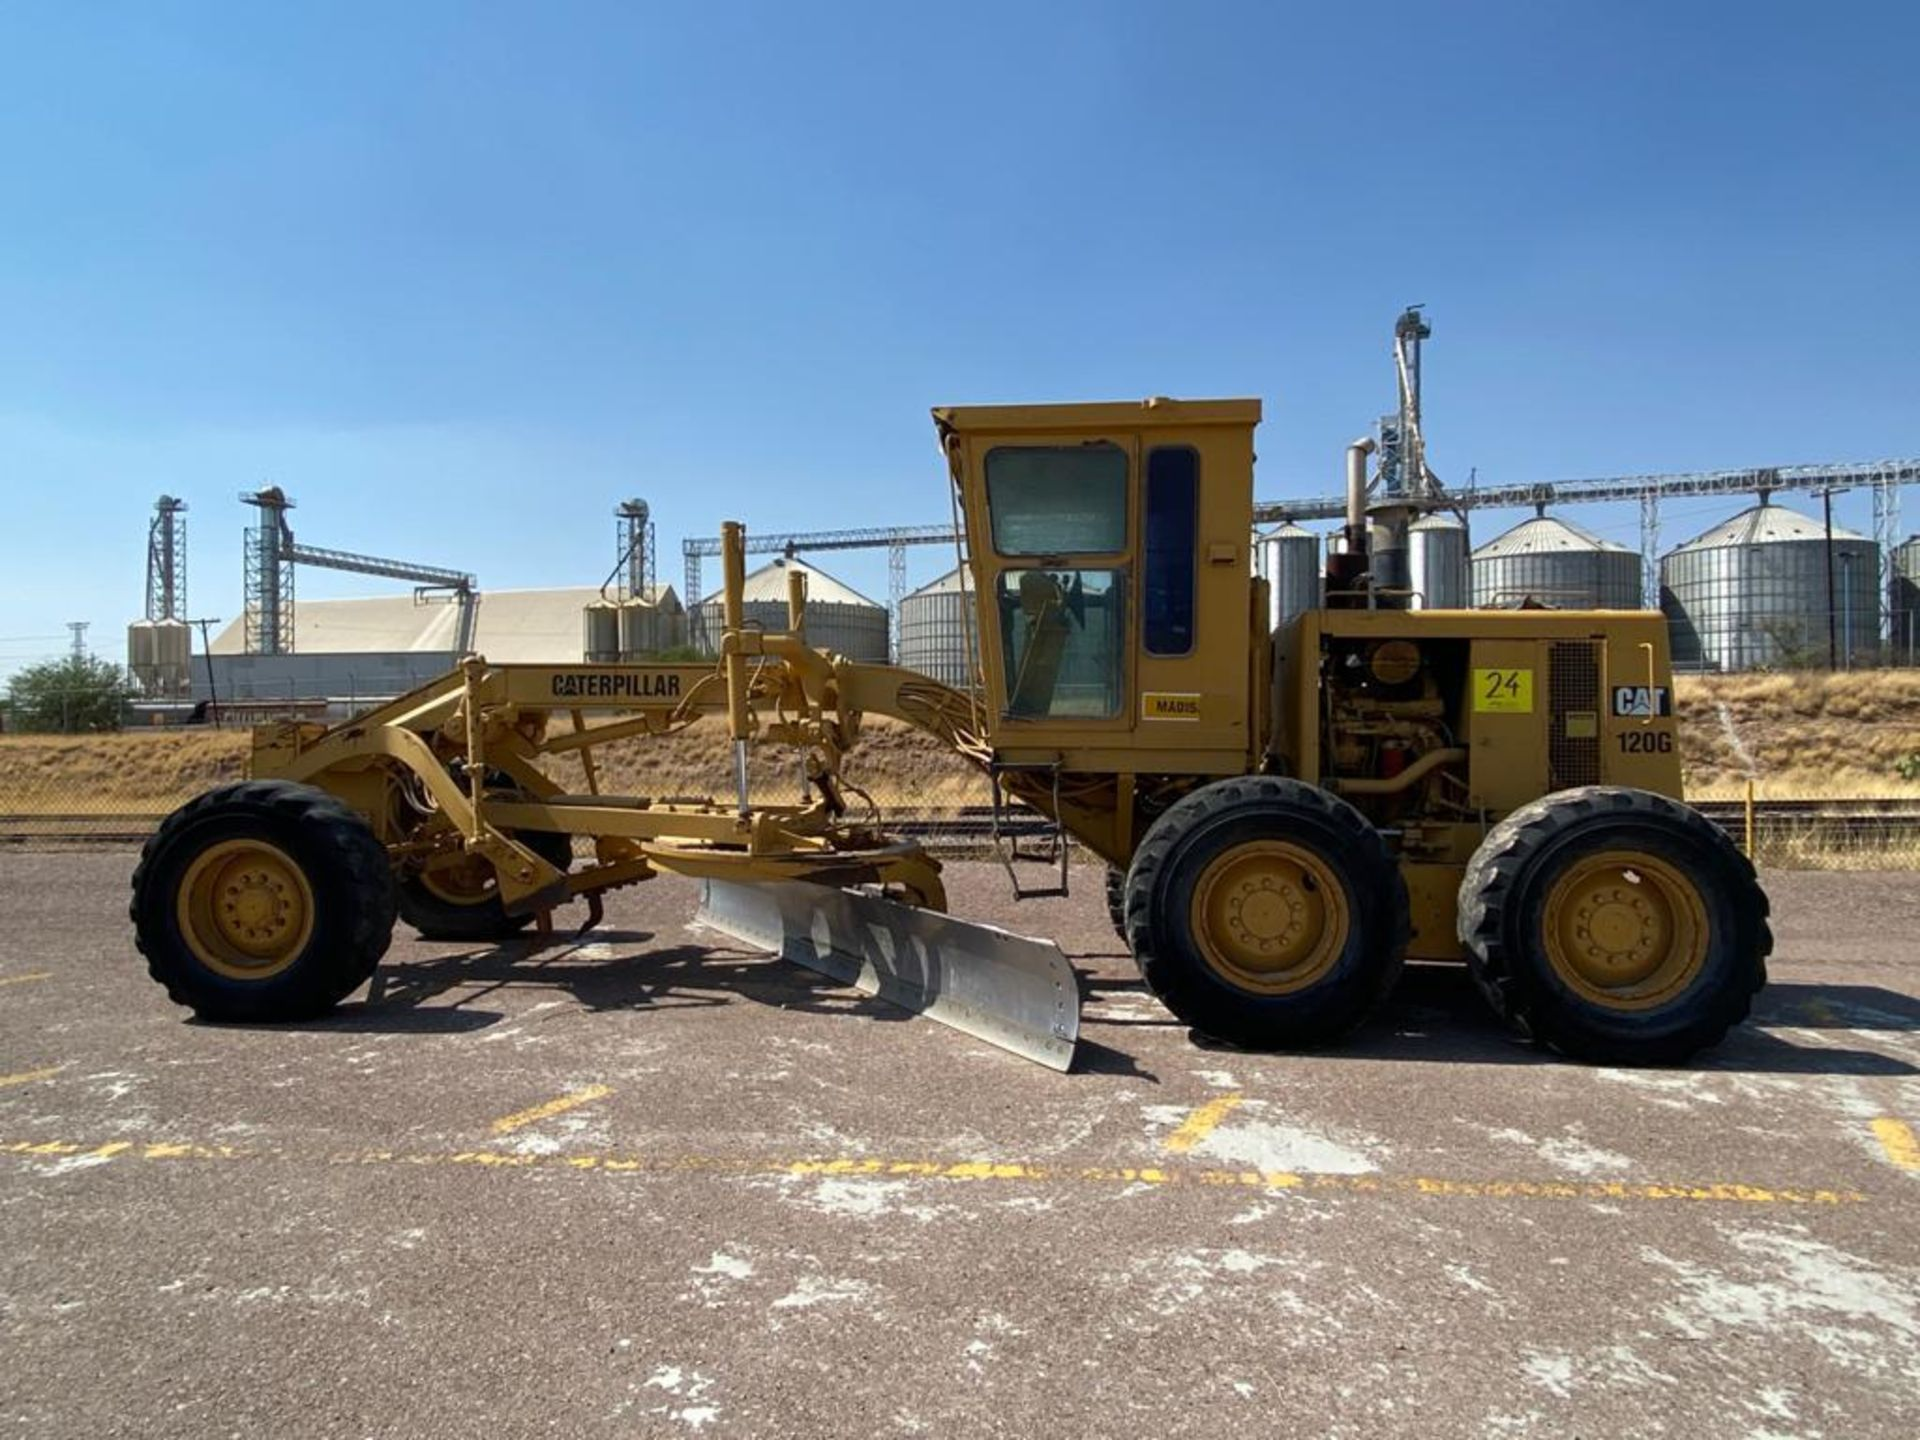 Caterpillar 120G Motor Grader, Serial number 87V09646, Motor number PQ883-2/07Z28983 - Image 10 of 61